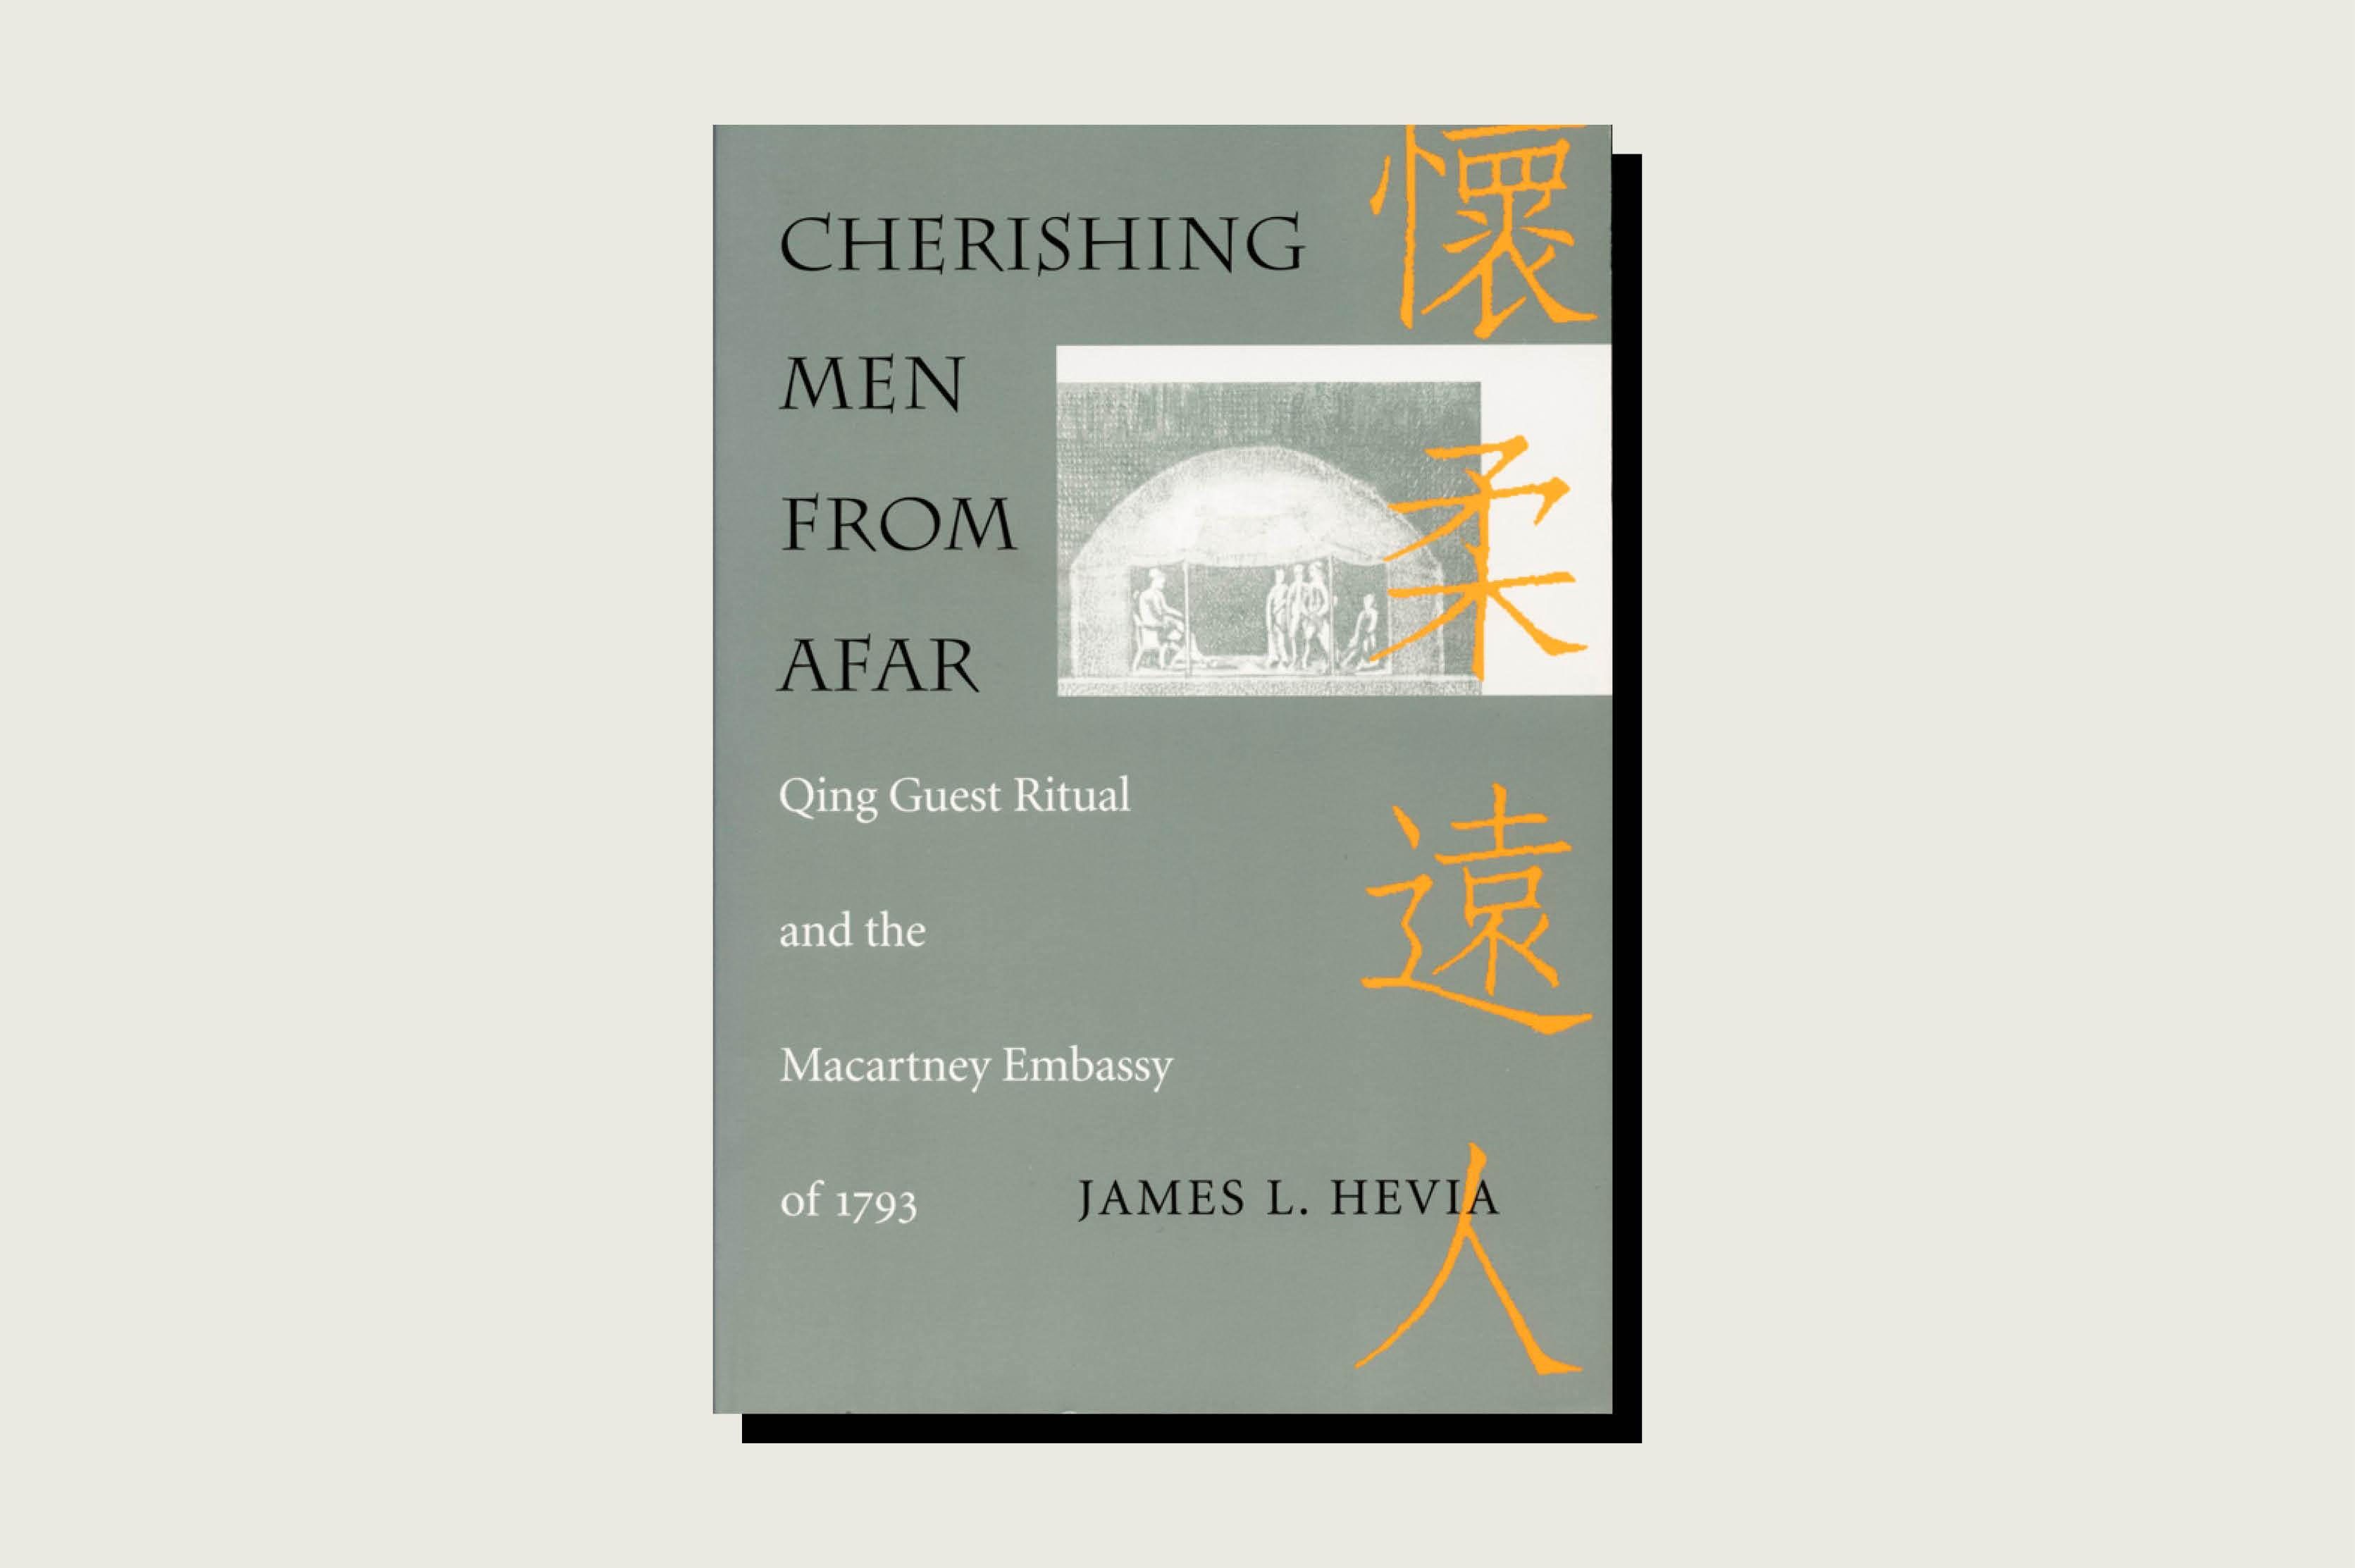 Cherishing Men From Afar: Qing Guest Ritual and the Macartney Embassy of 1793, James L. Hevia, Duke University Press, 1995.